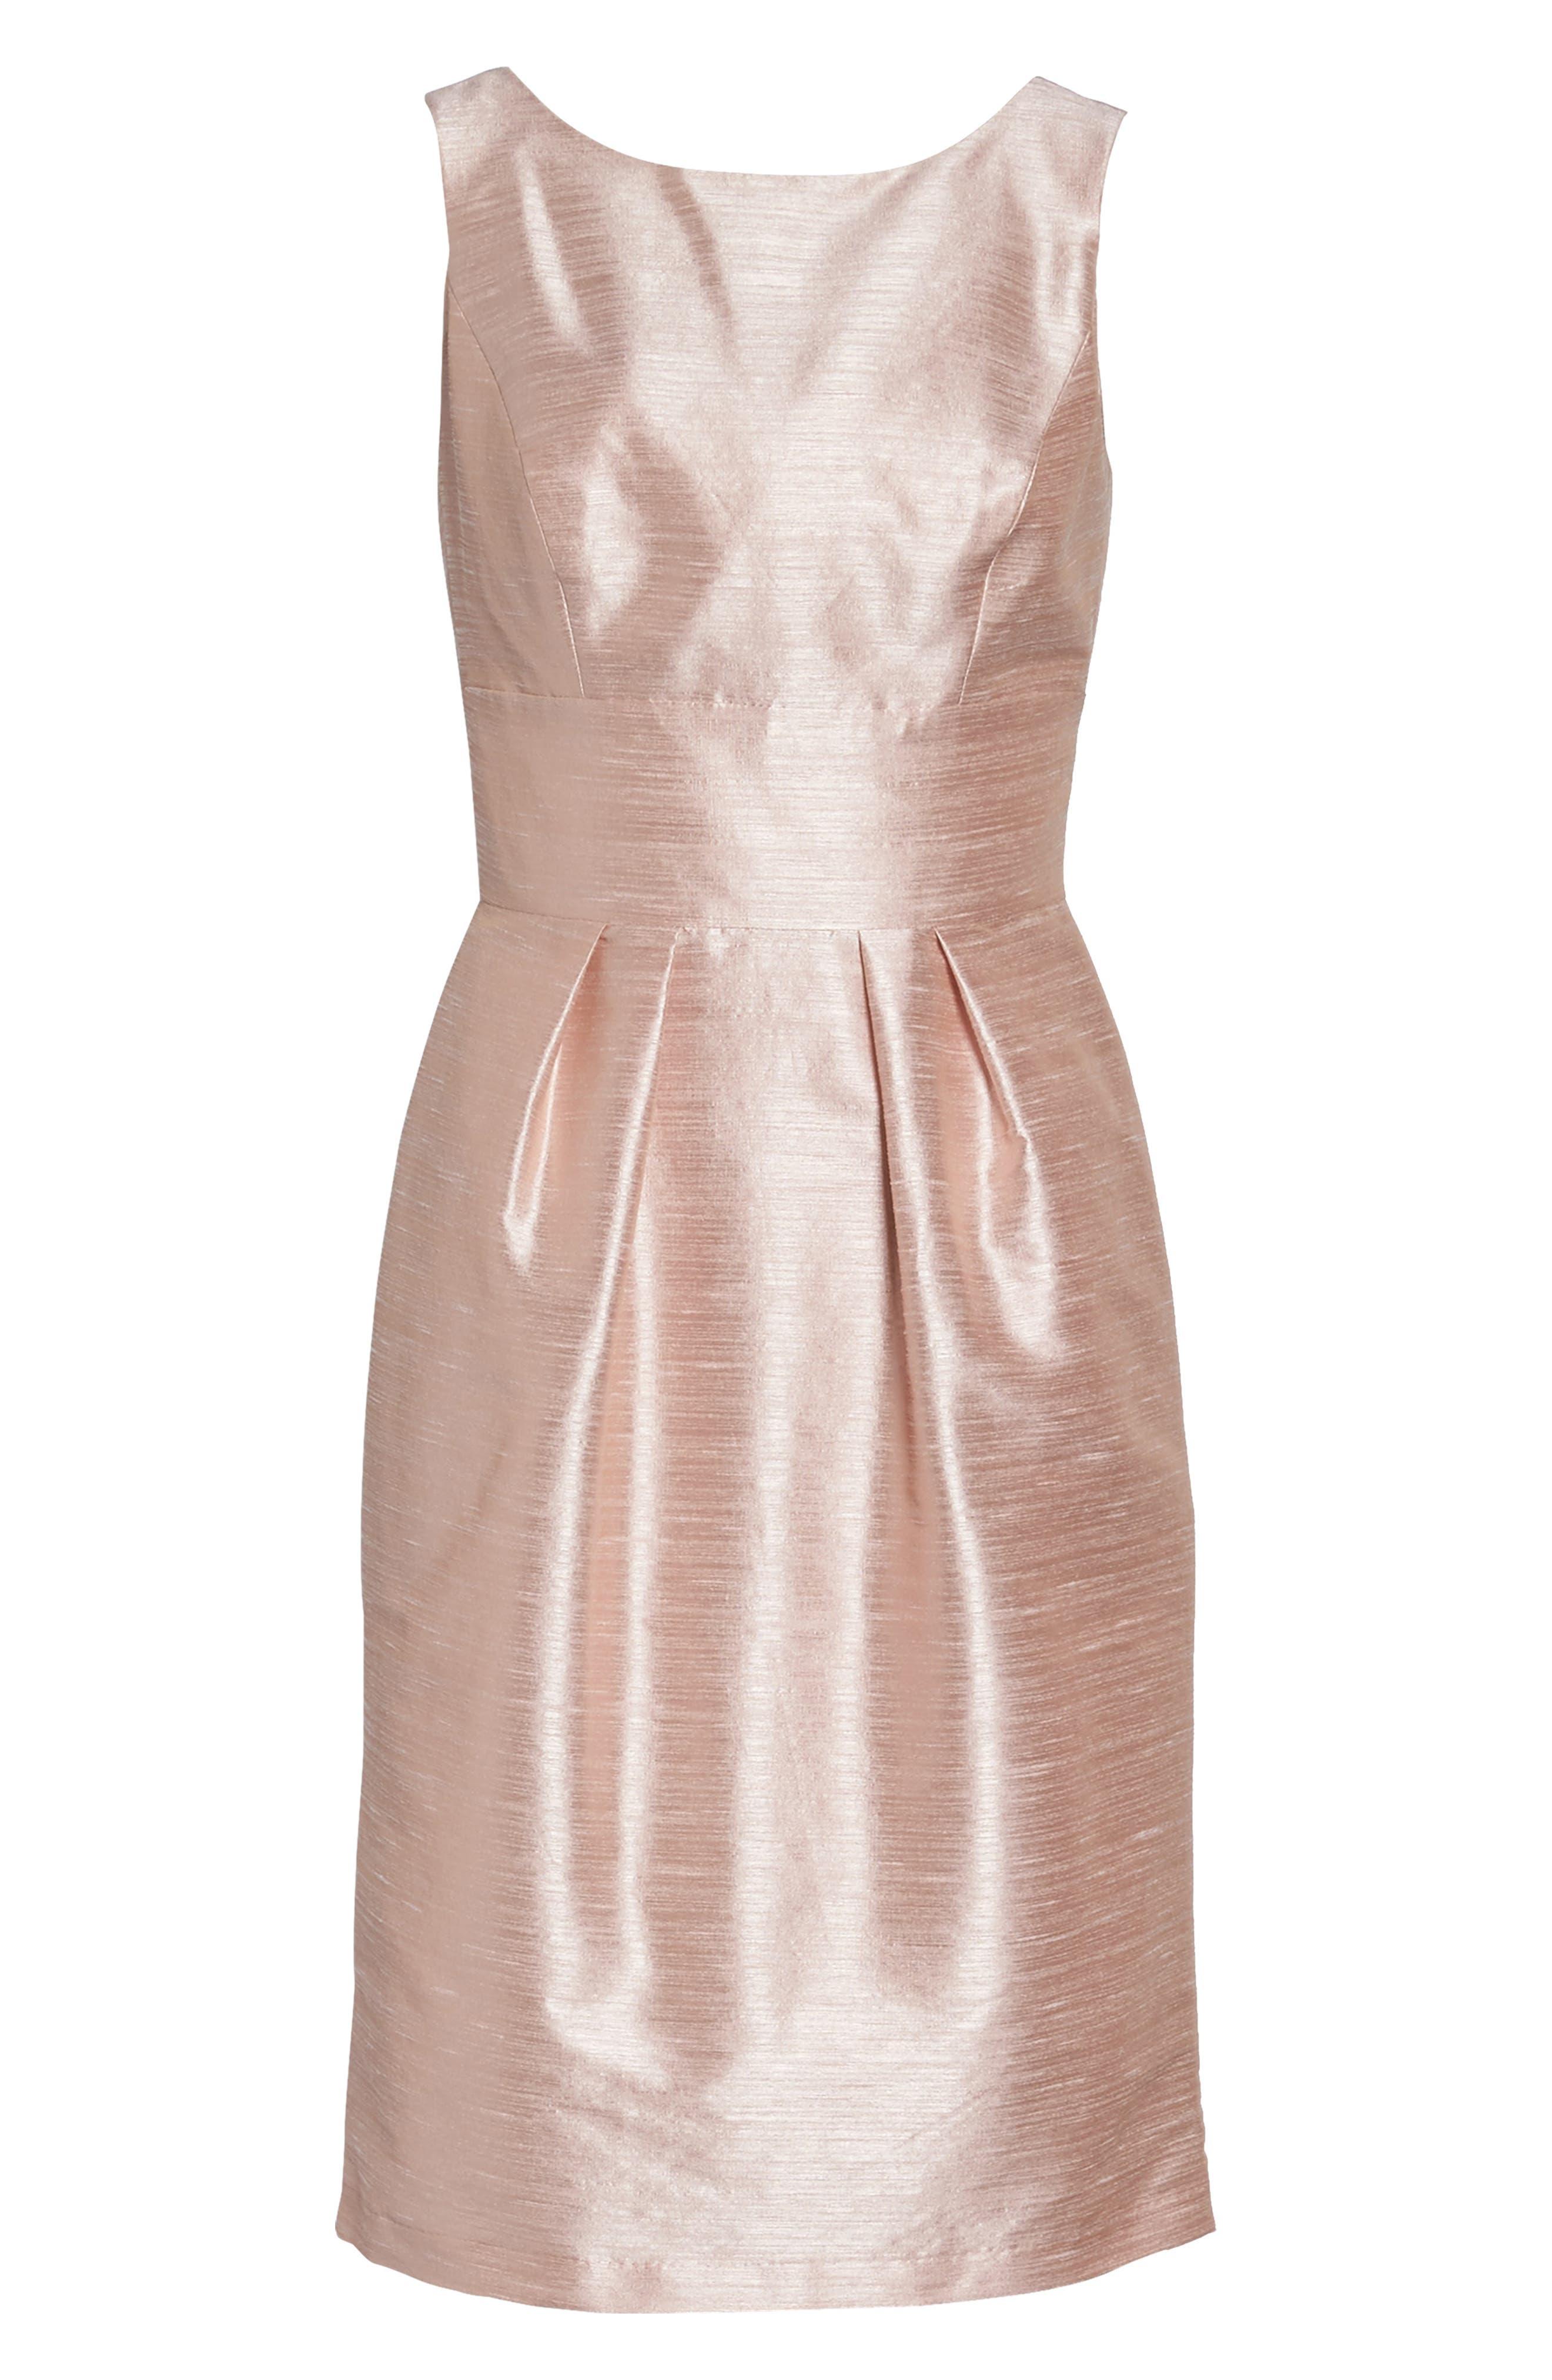 Boatneck Sheath Dress,                             Alternate thumbnail 8, color,                             PEARL PINK